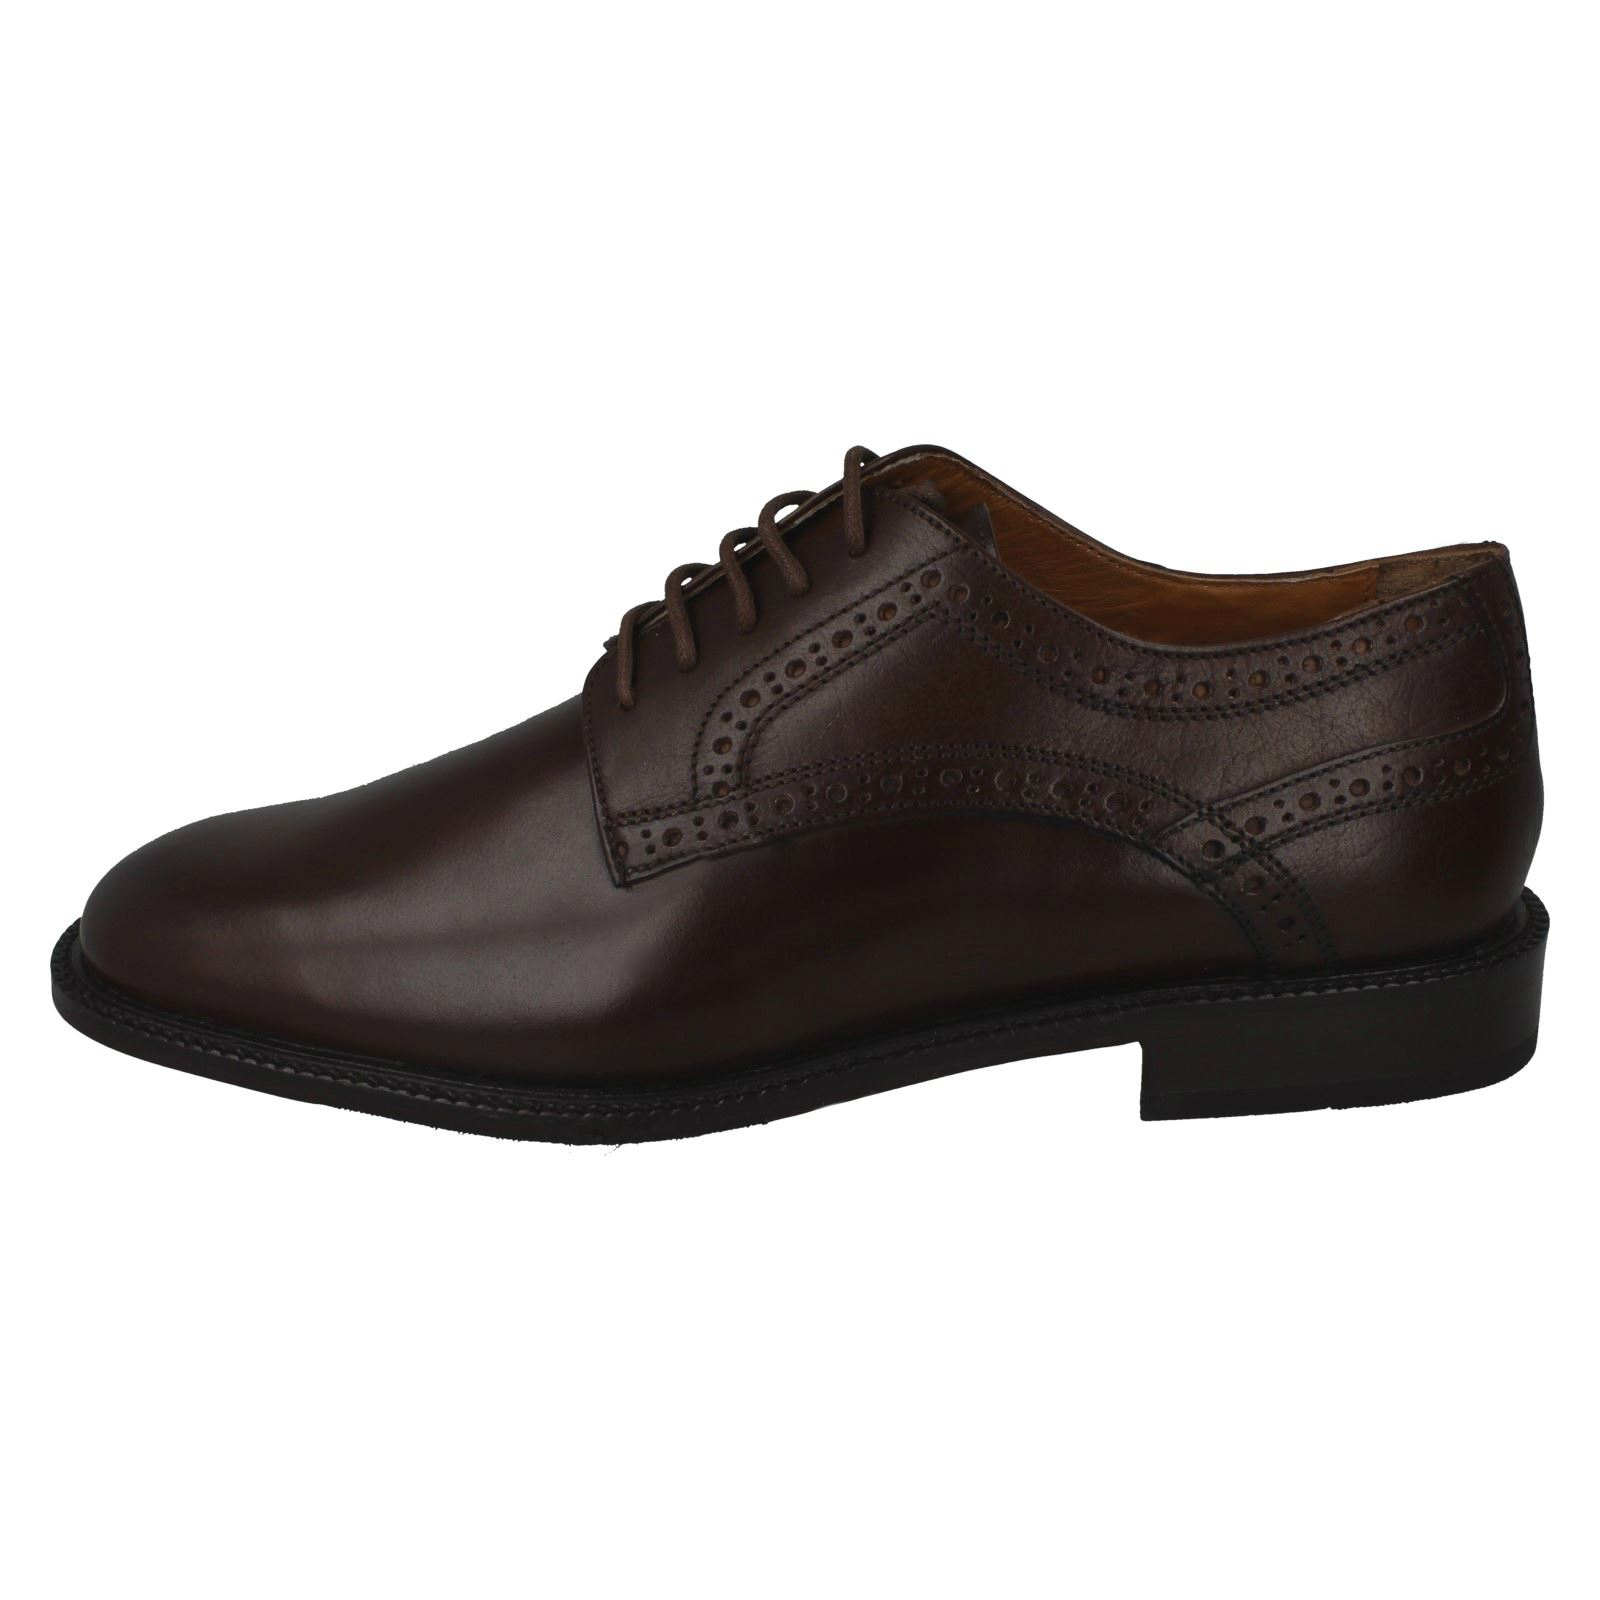 lacets City cuir Mens Chaussures Steps en Torino Brown a4dqdwT